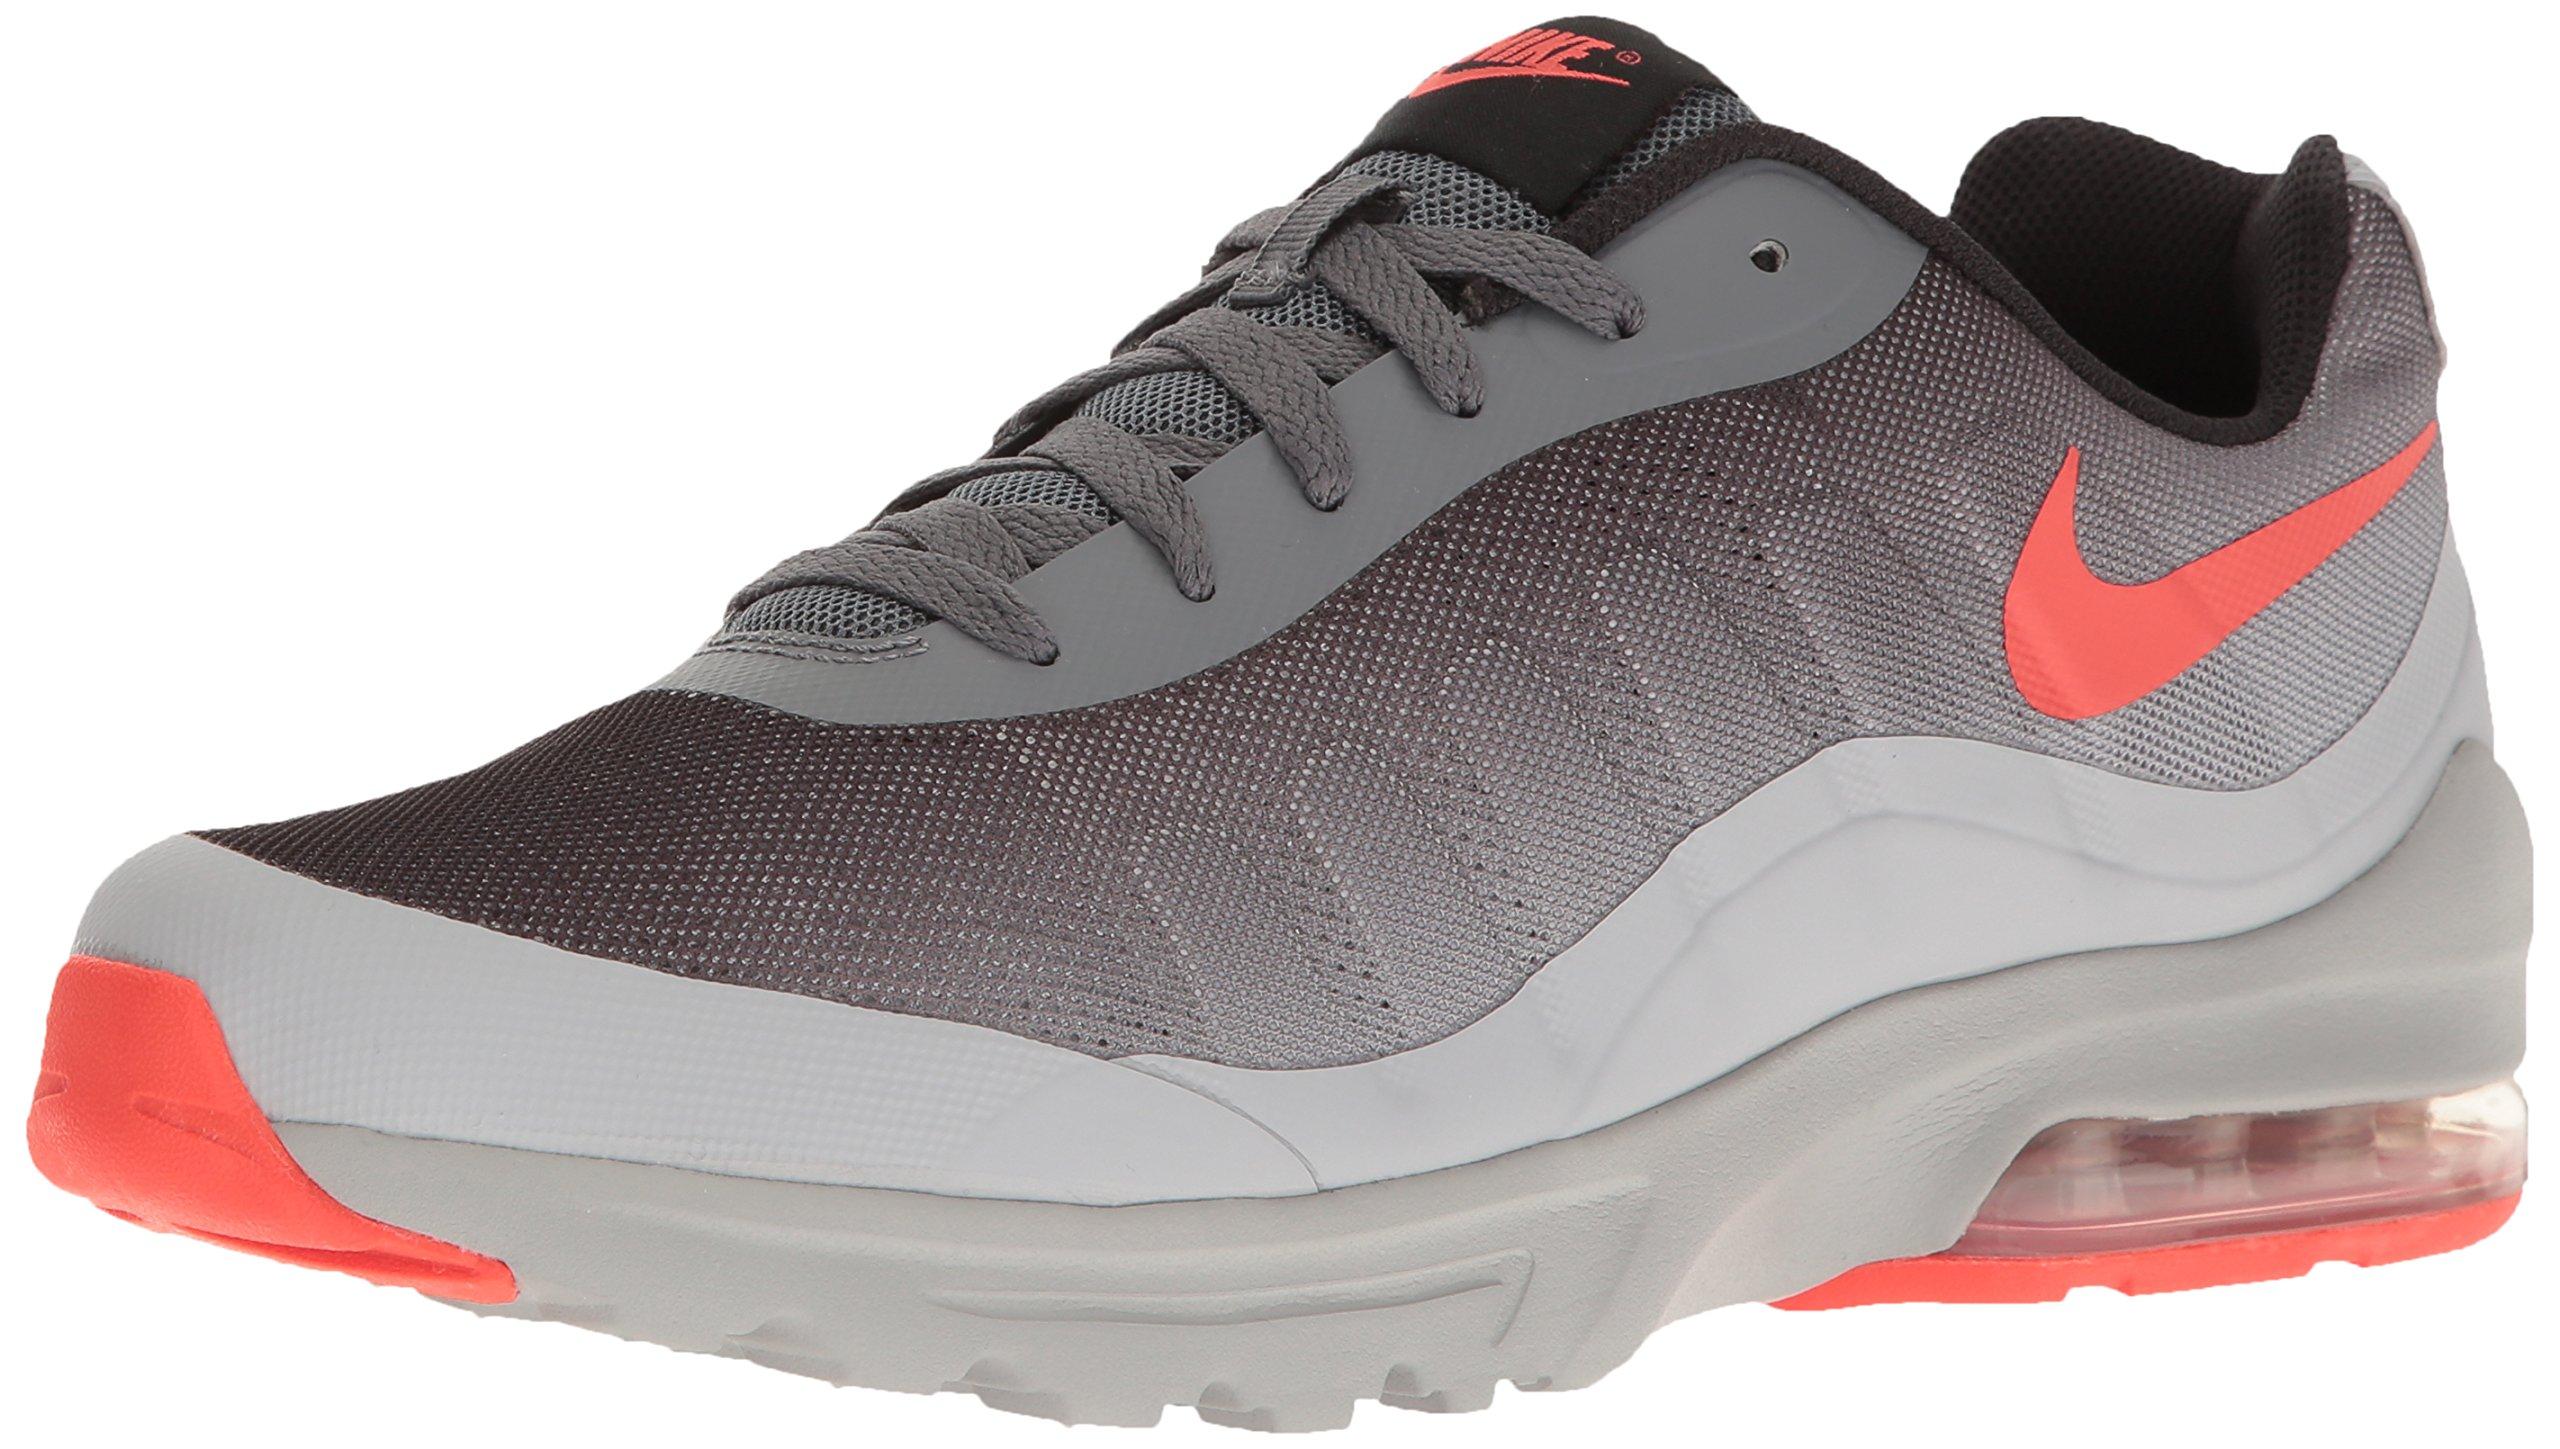 info for 5acff 320ed Galleon - NIKE Men s Air Max Invigor Print Running Shoe, Dark Grey Max  Orange Wolf Grey Black, 15 D(M) US